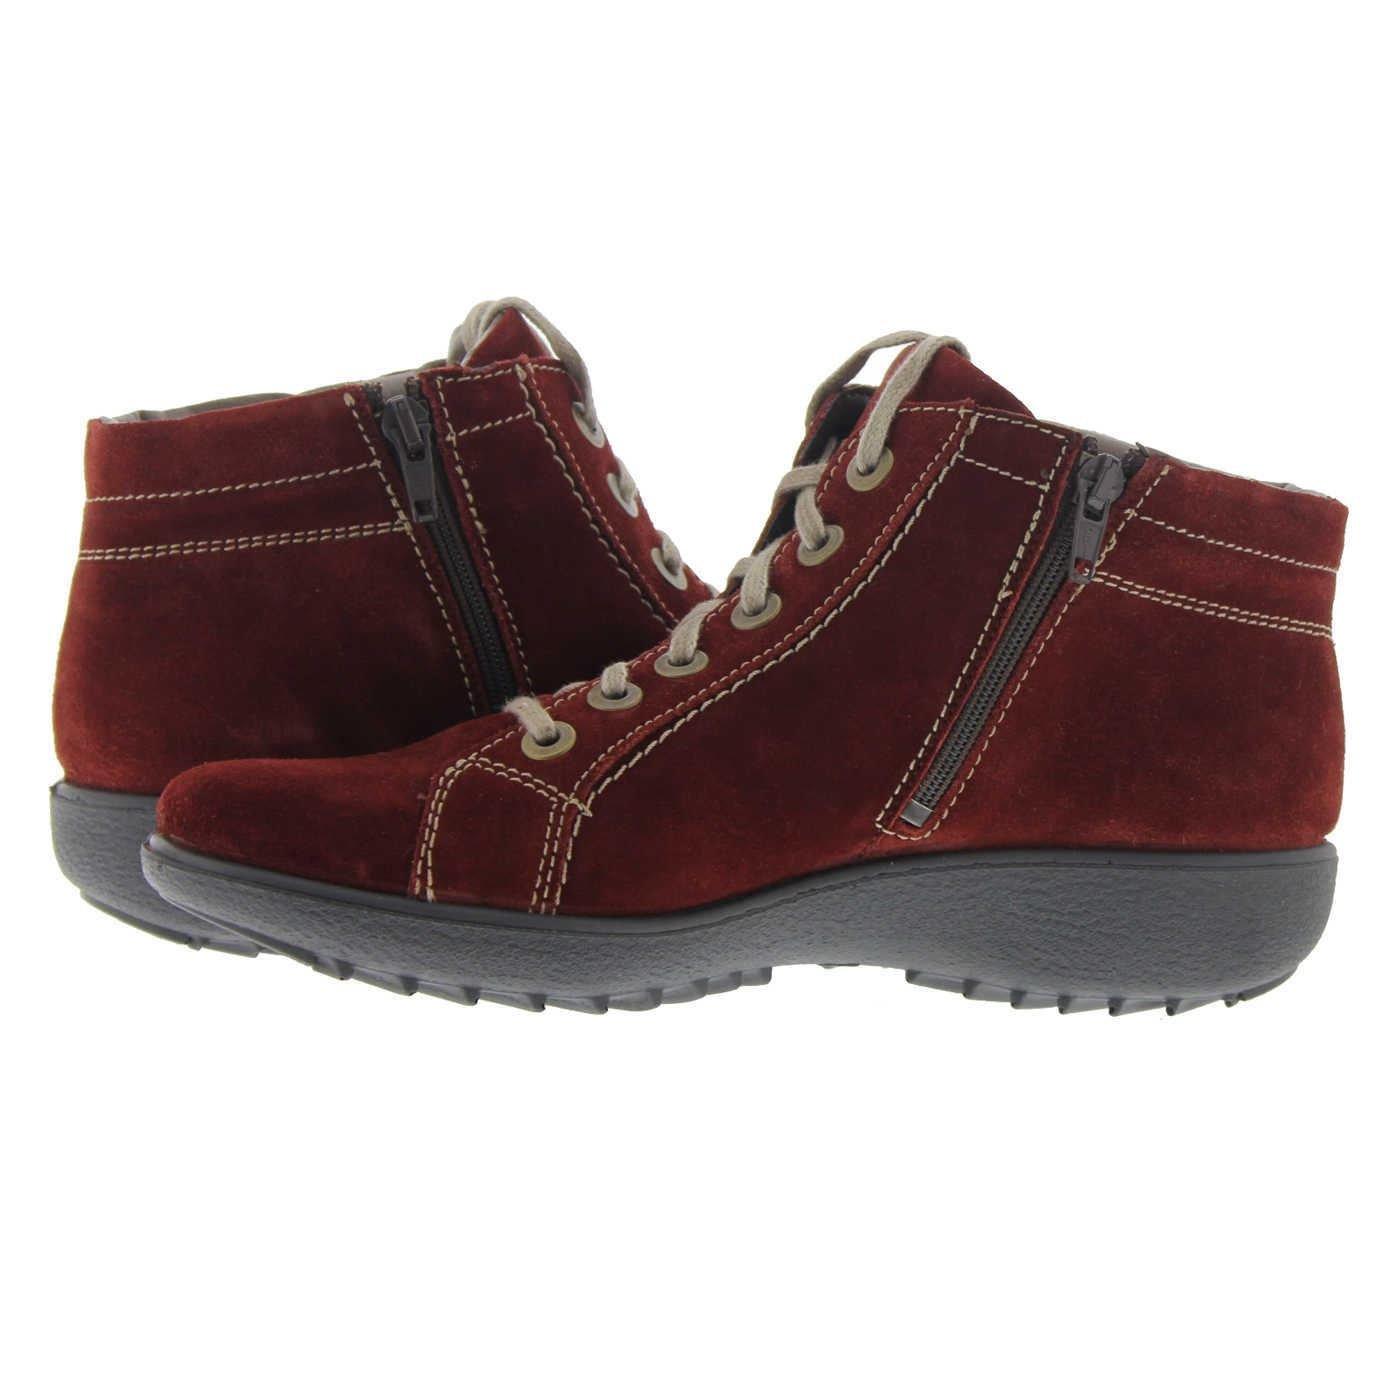 Romika Womens Nadja 136 Red Suede Boots 39 EU JoE0YM